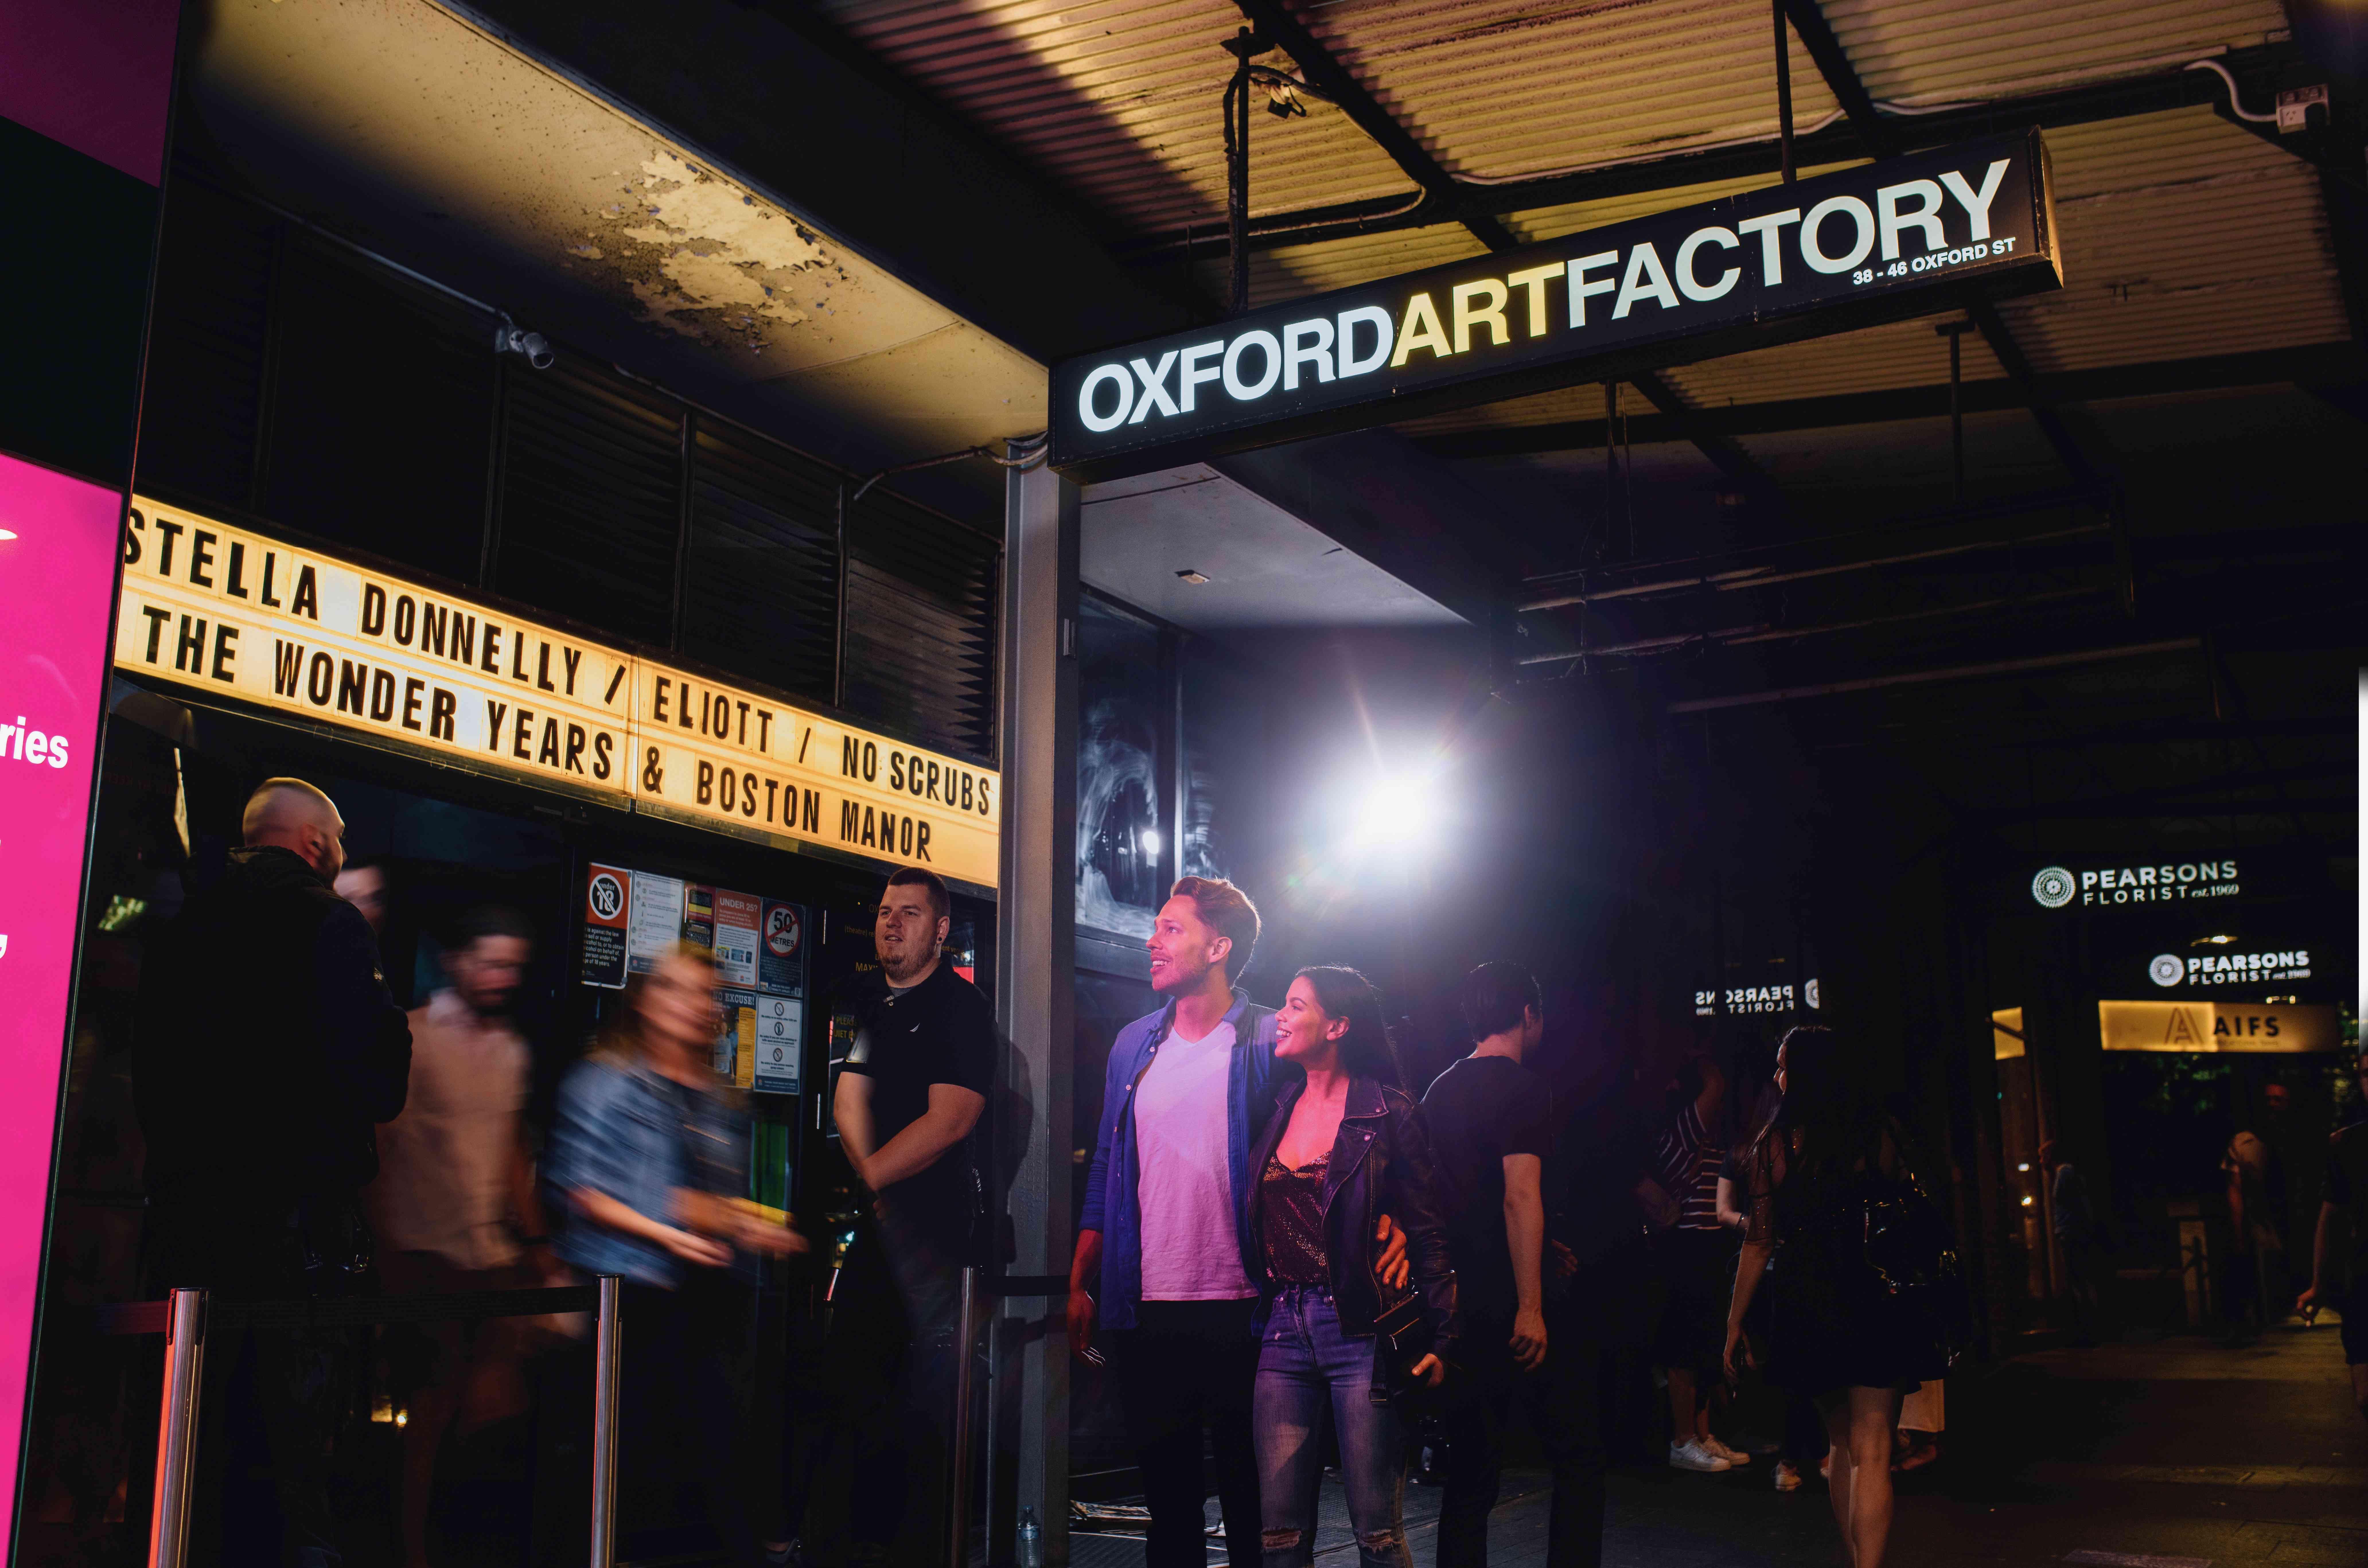 Oxford Art Factory music venue